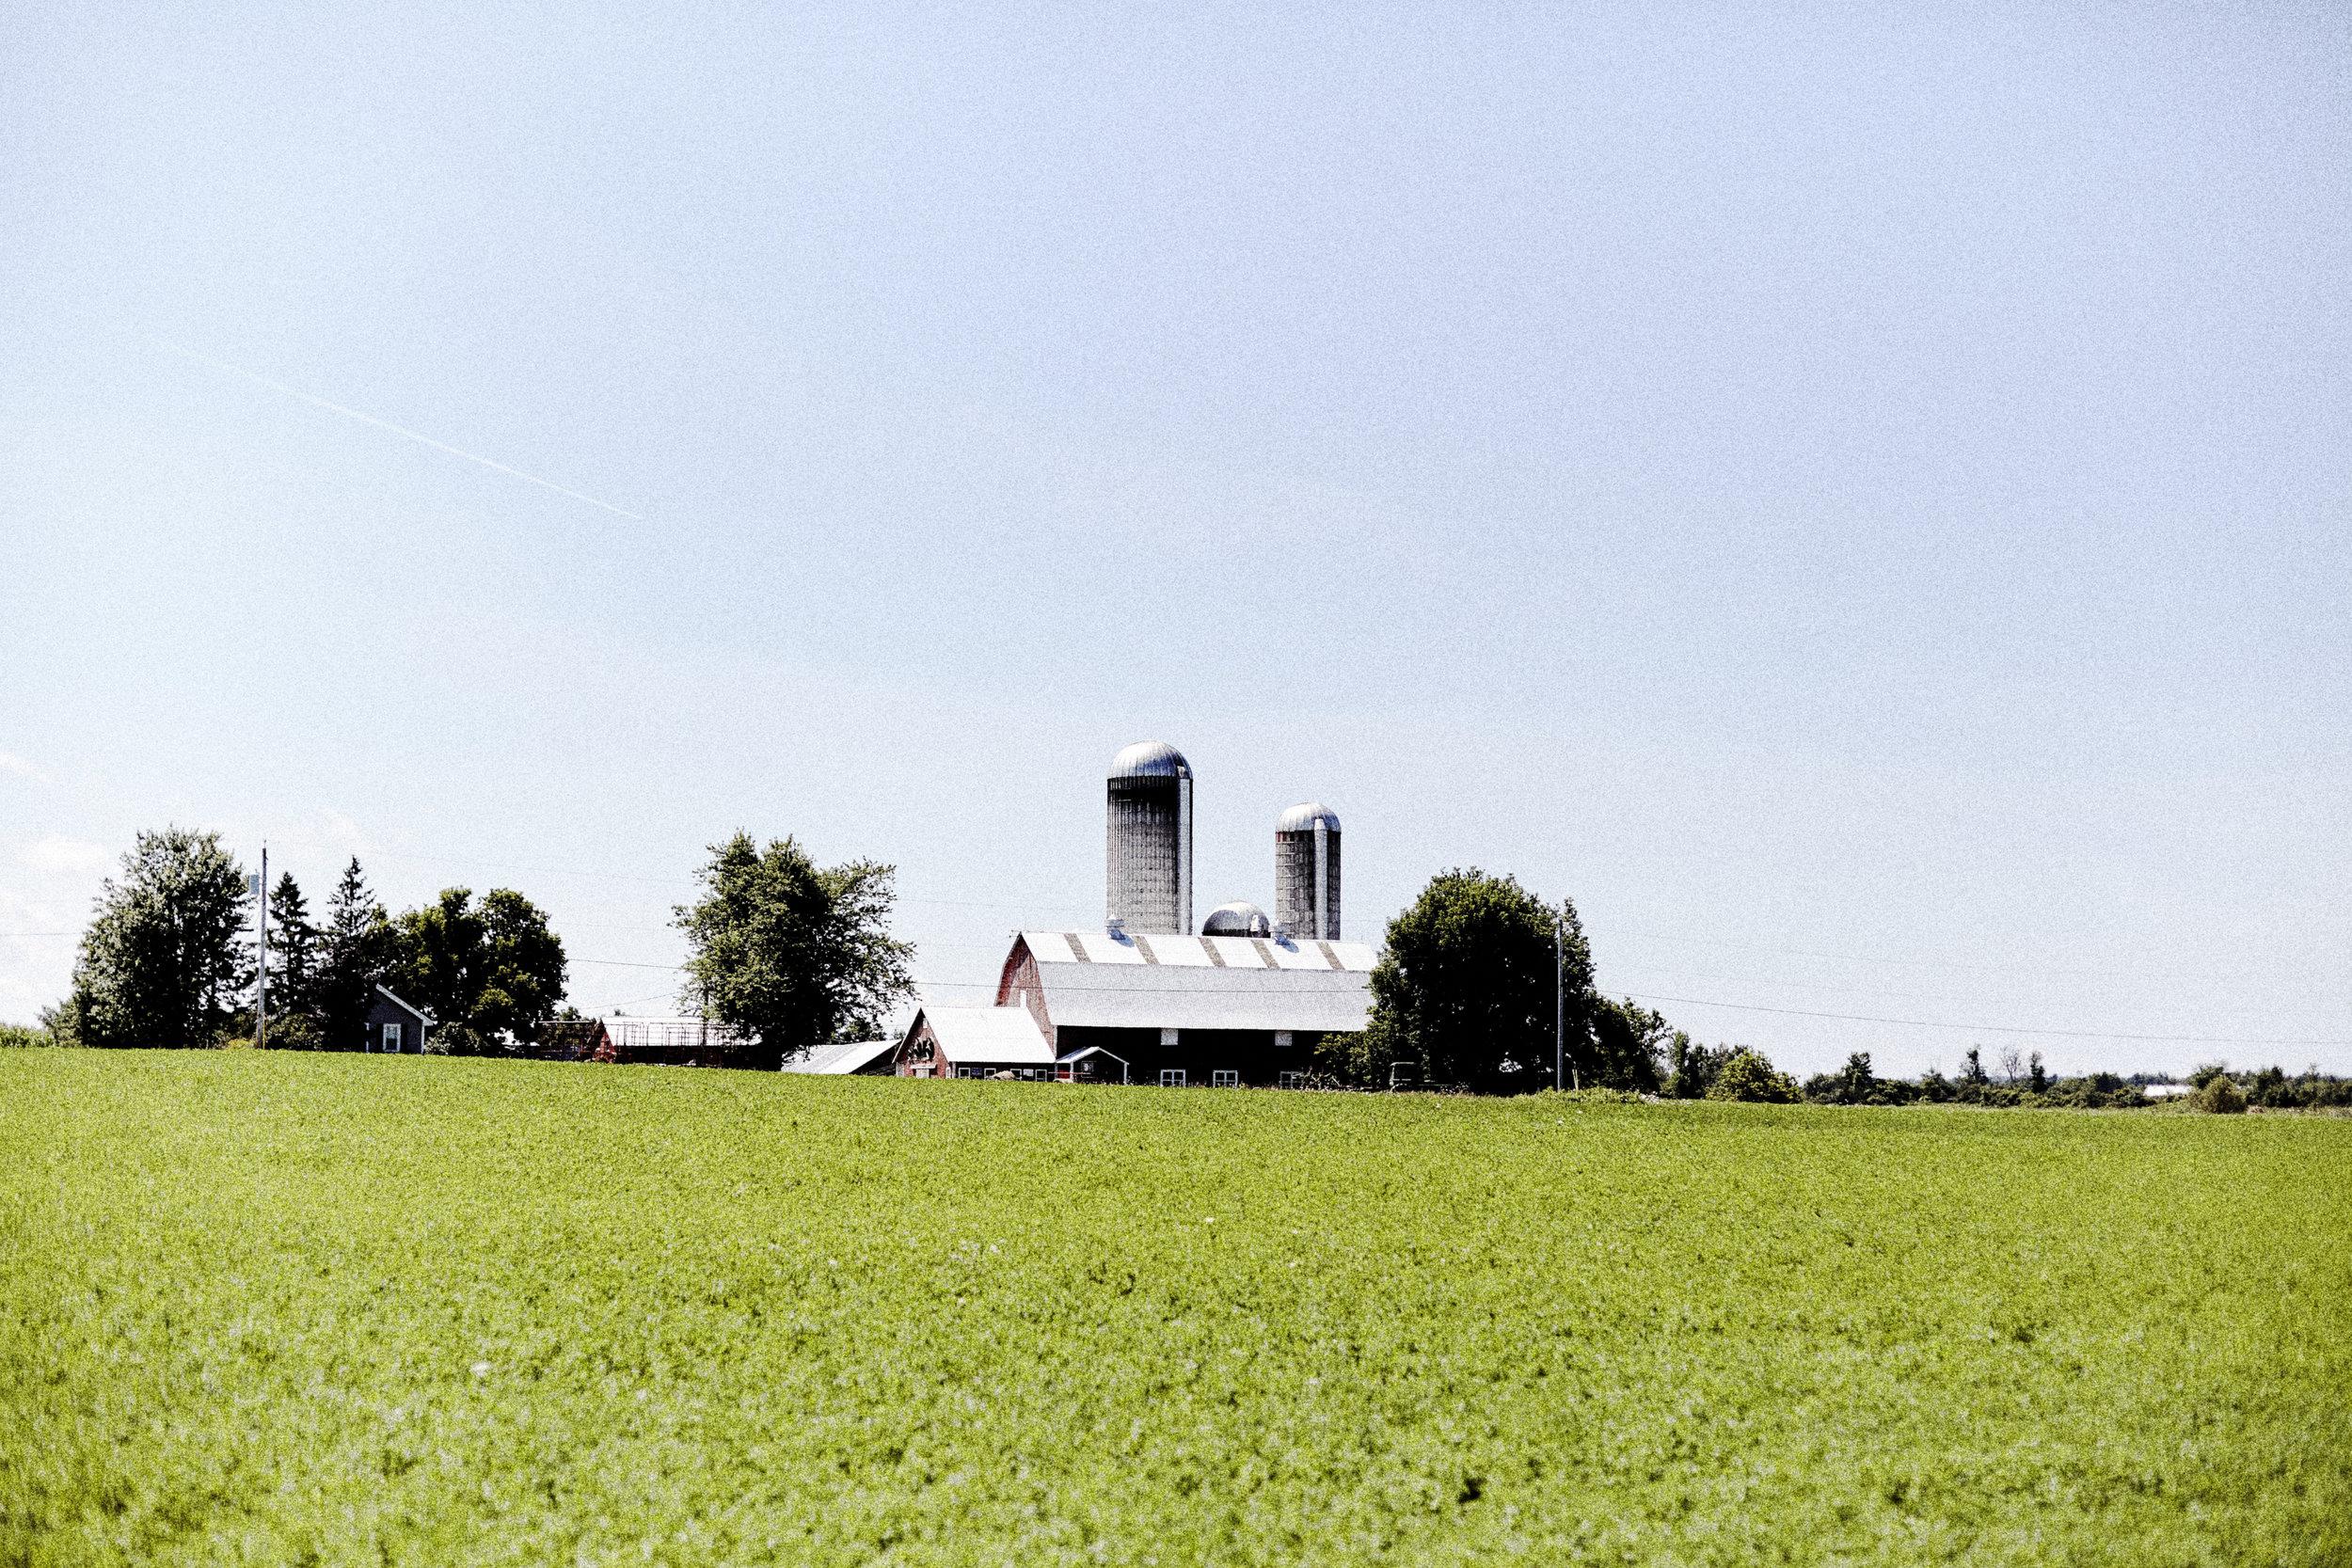 Farm_Chris_Lee_108.jpg